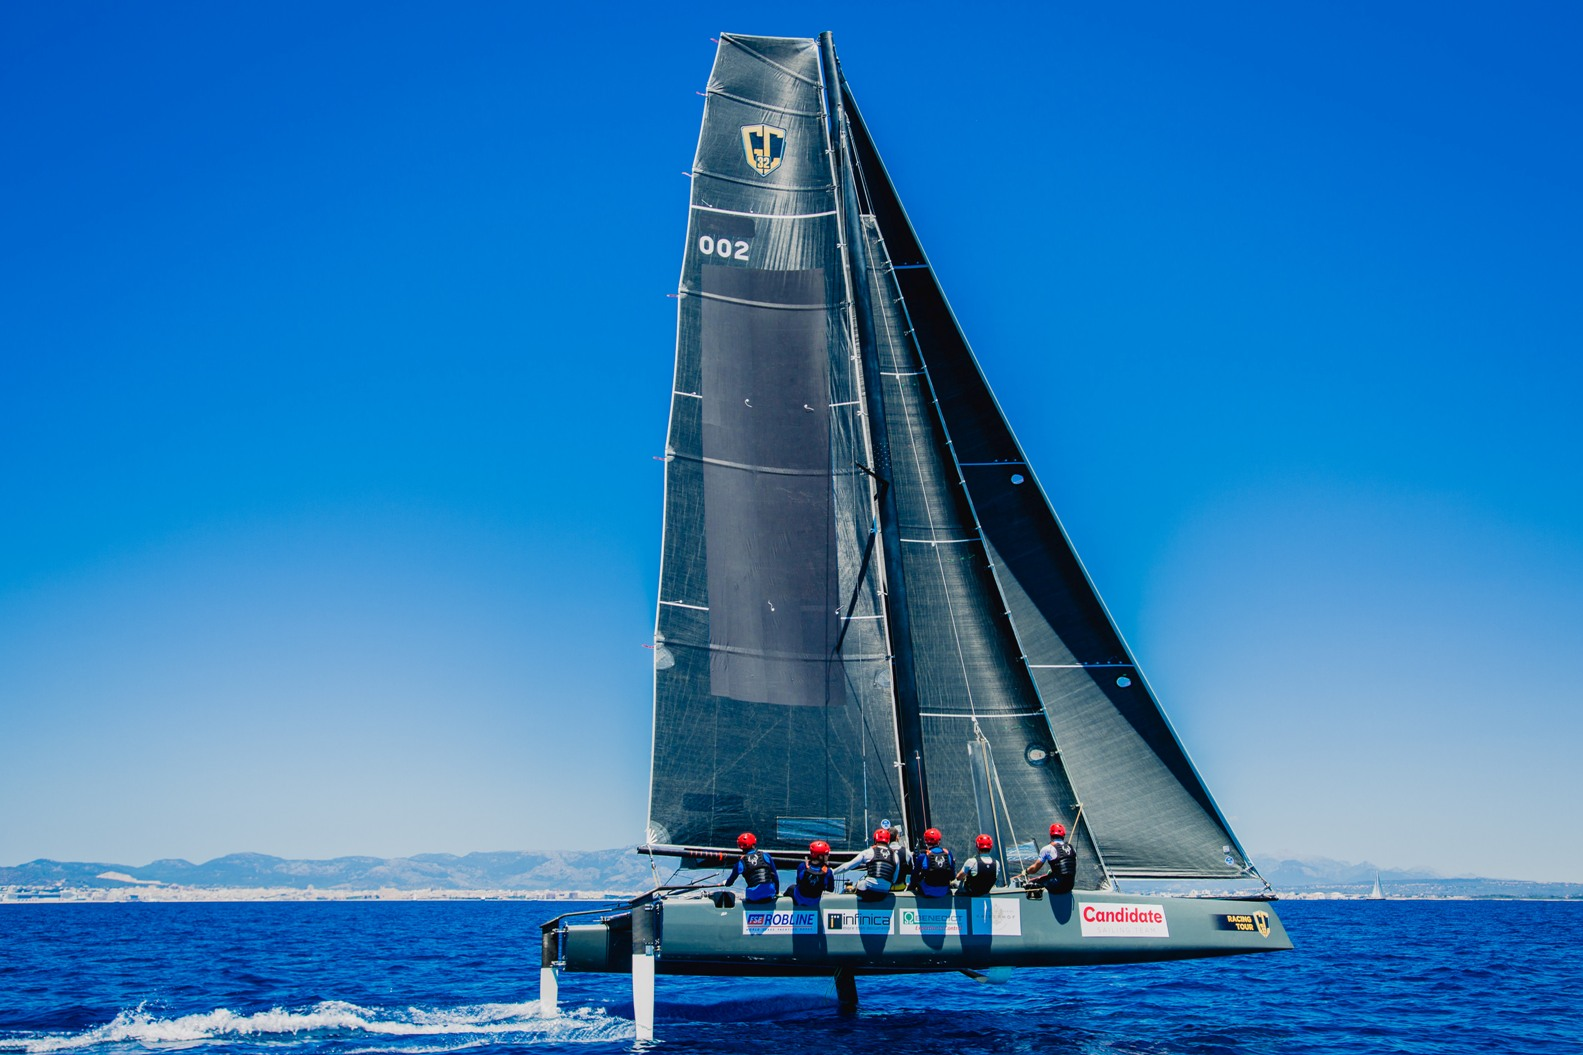 Candidate Sailing Team beim Foilen vor Palma 01 send c_CST dapic.rocks